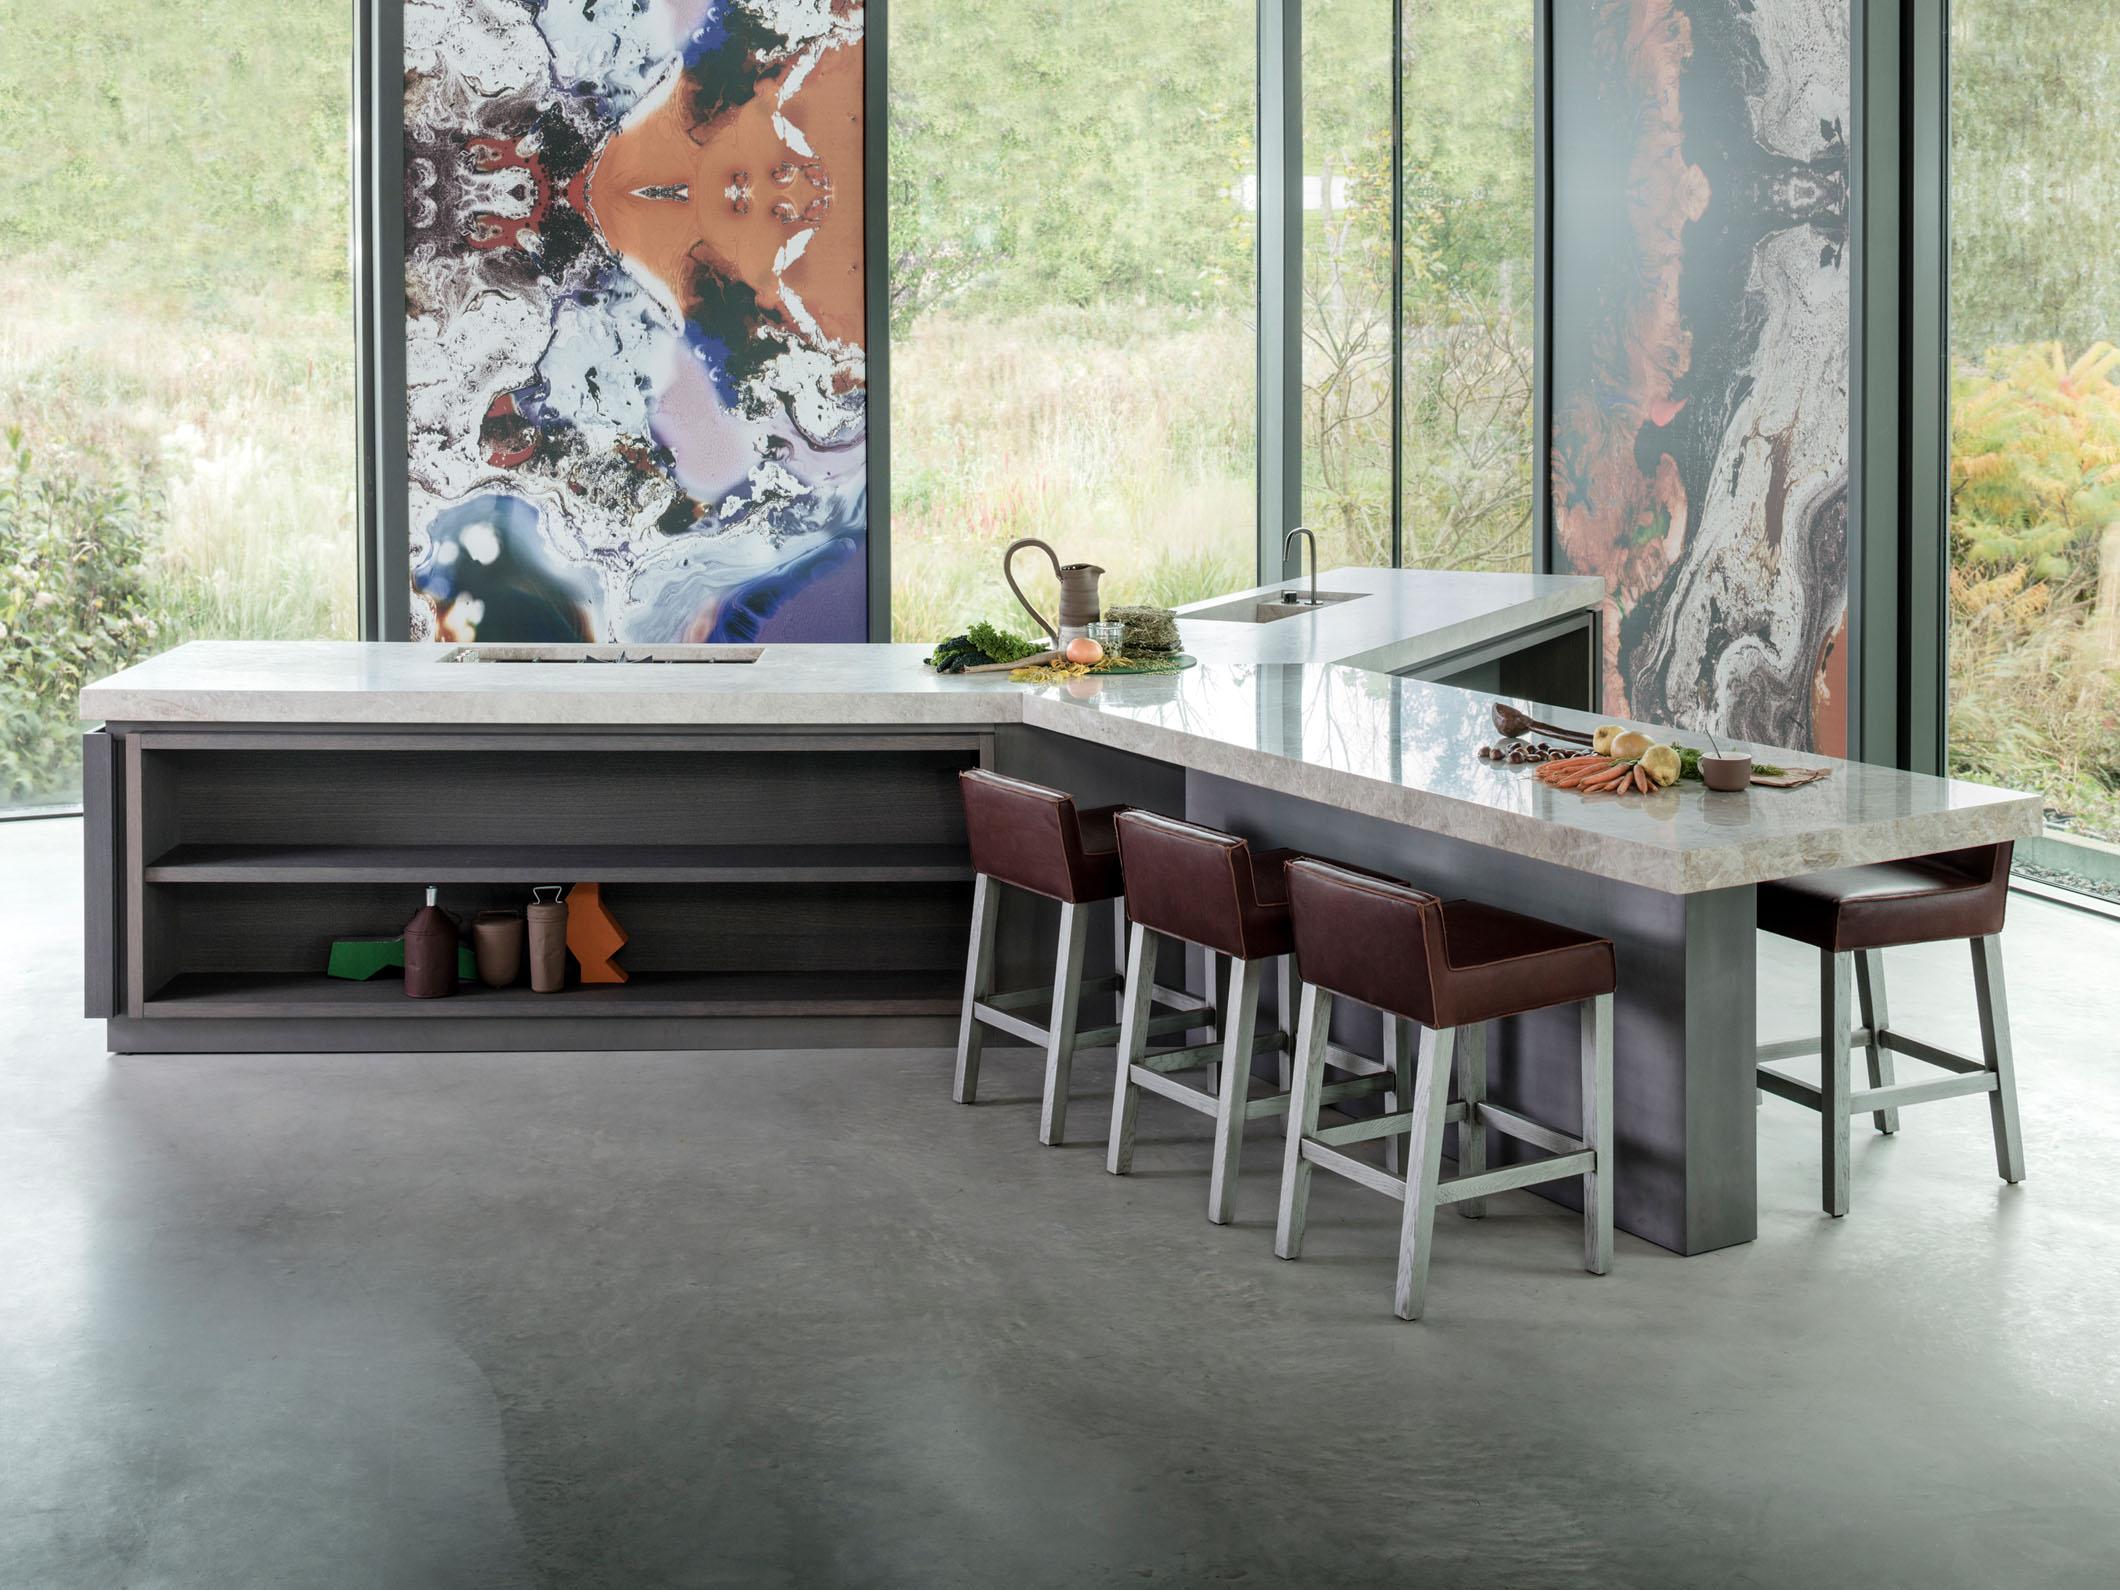 product-design-kitchen-edge-sk-big-image-001